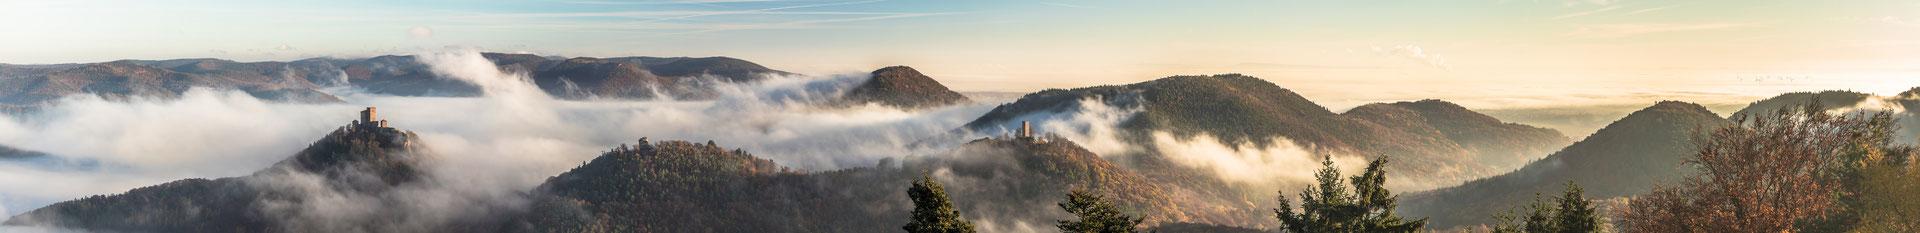 Burg Trifels im Nebel